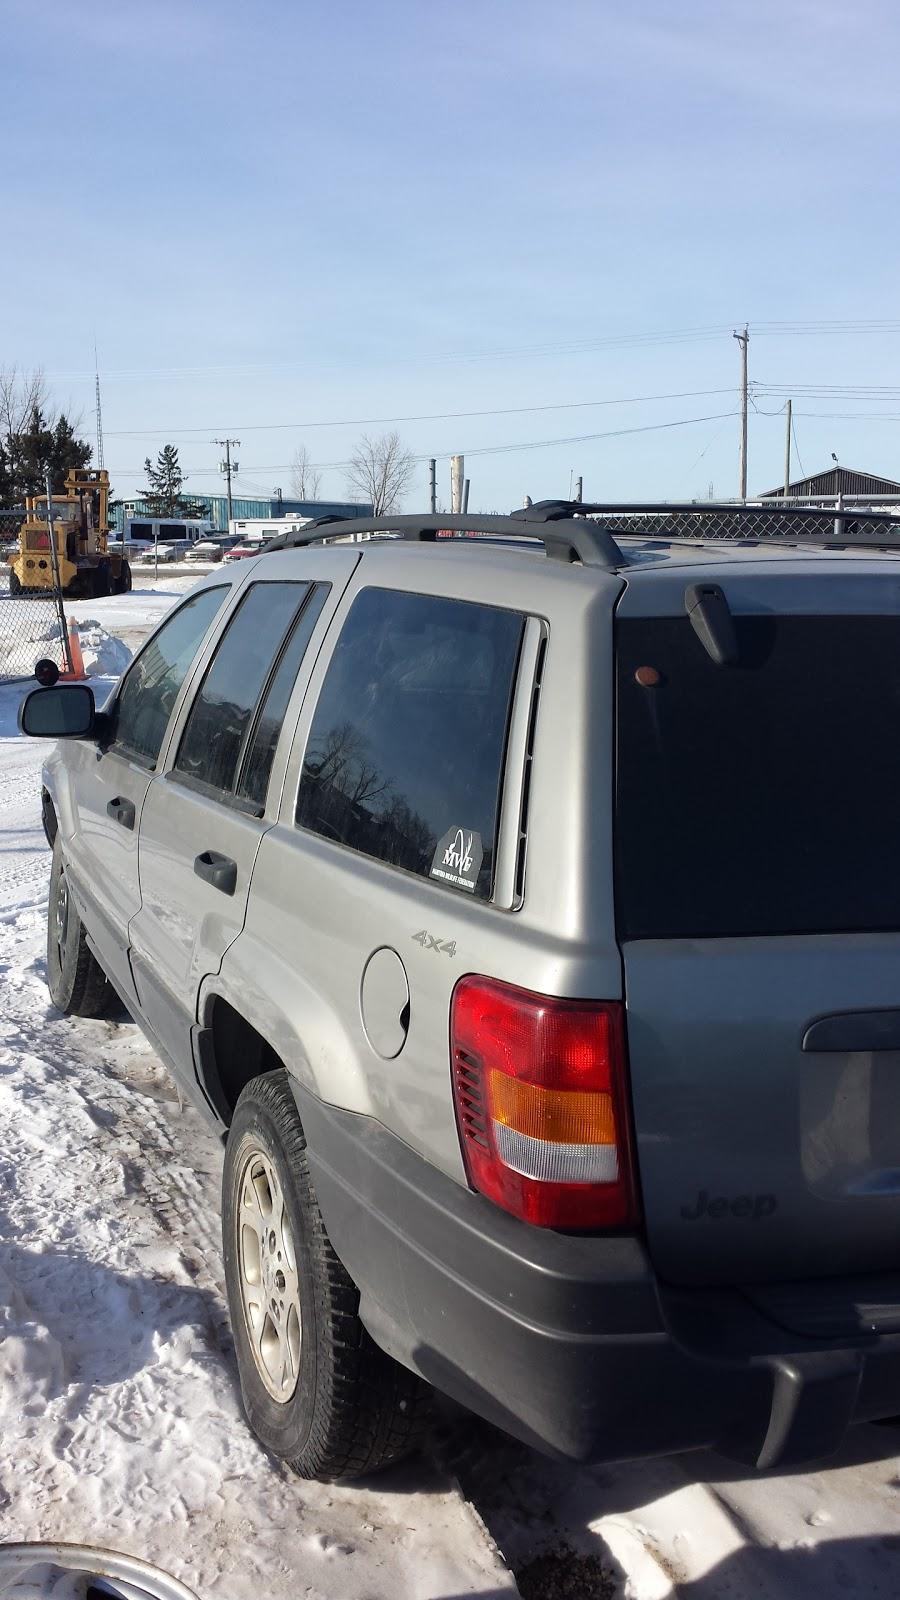 Midnight Auto & Truck Parts | car repair | 1150 Redonda St, Springfield, MB R2C 2Z2, Canada | 2042222626 OR +1 204-222-2626